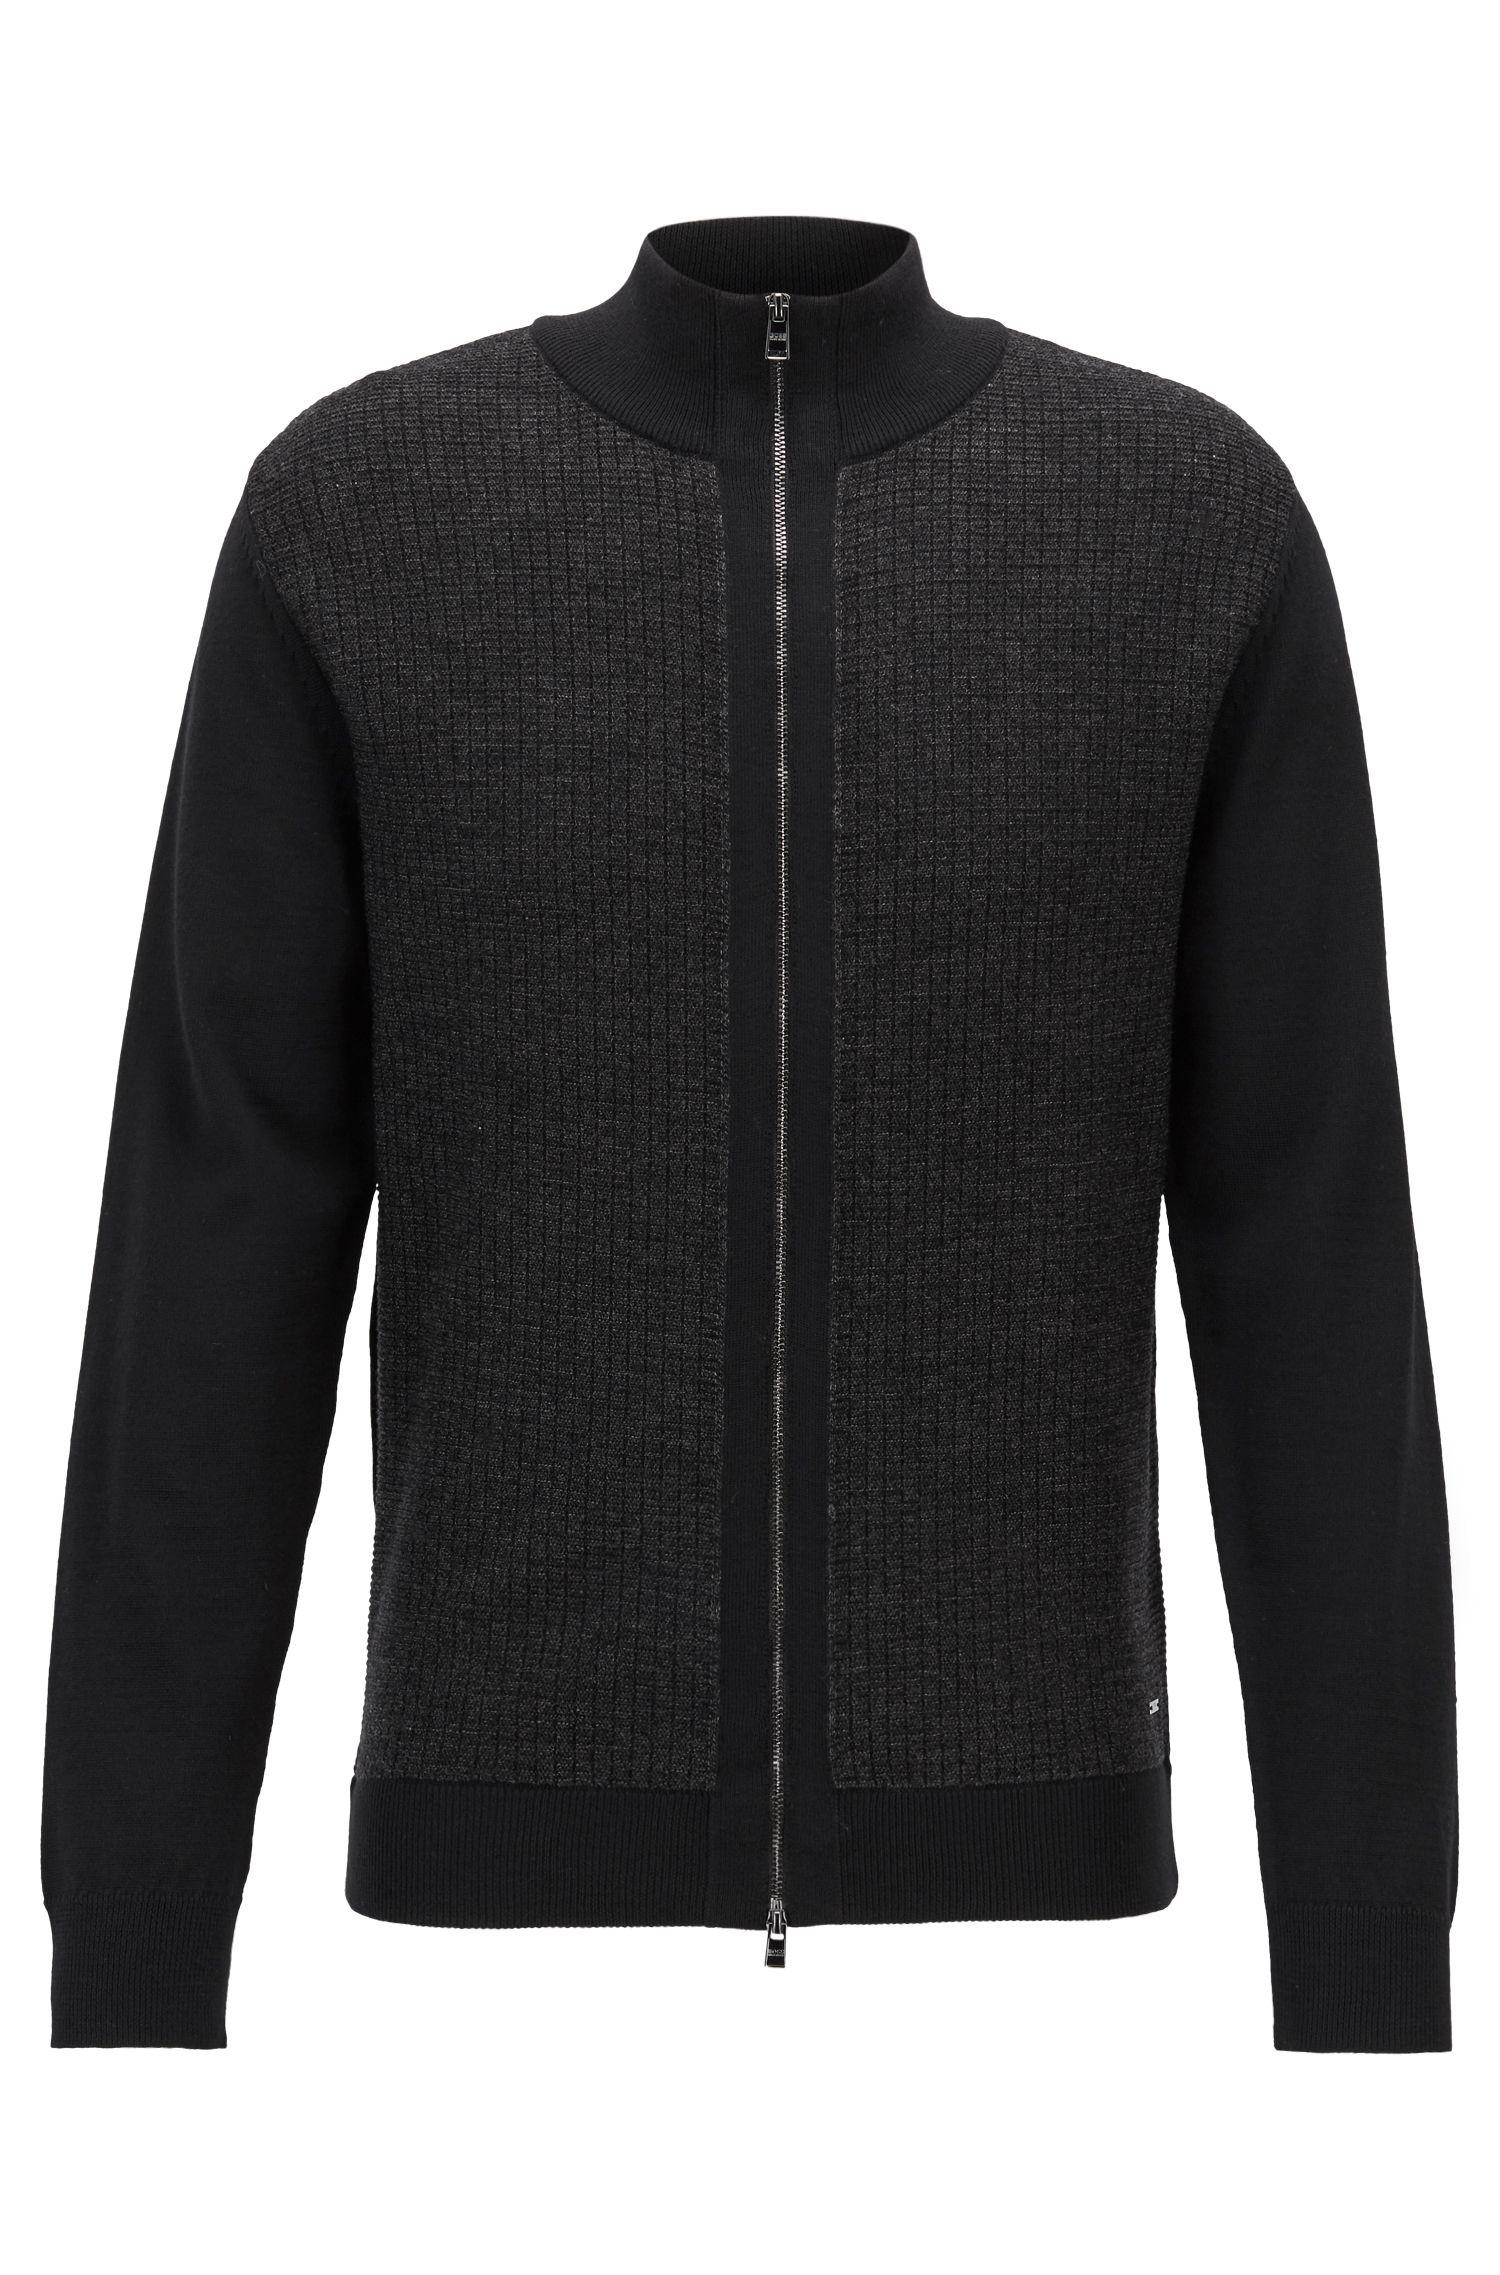 Regular-fit zippered cardigan in Italian merino wool, Black